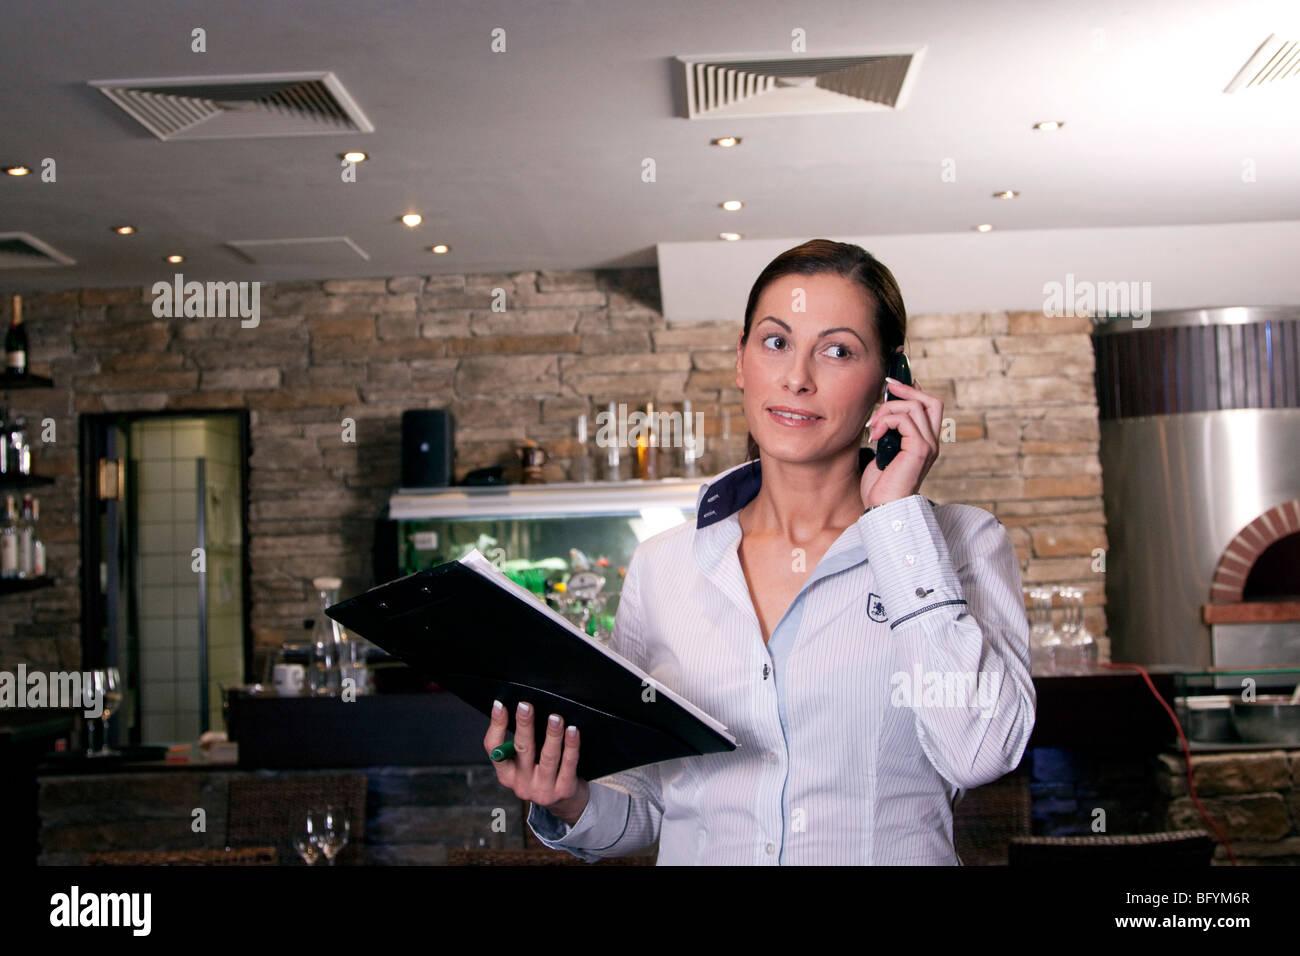 restaurant owner taking reservation on mobile phone - Stock Image